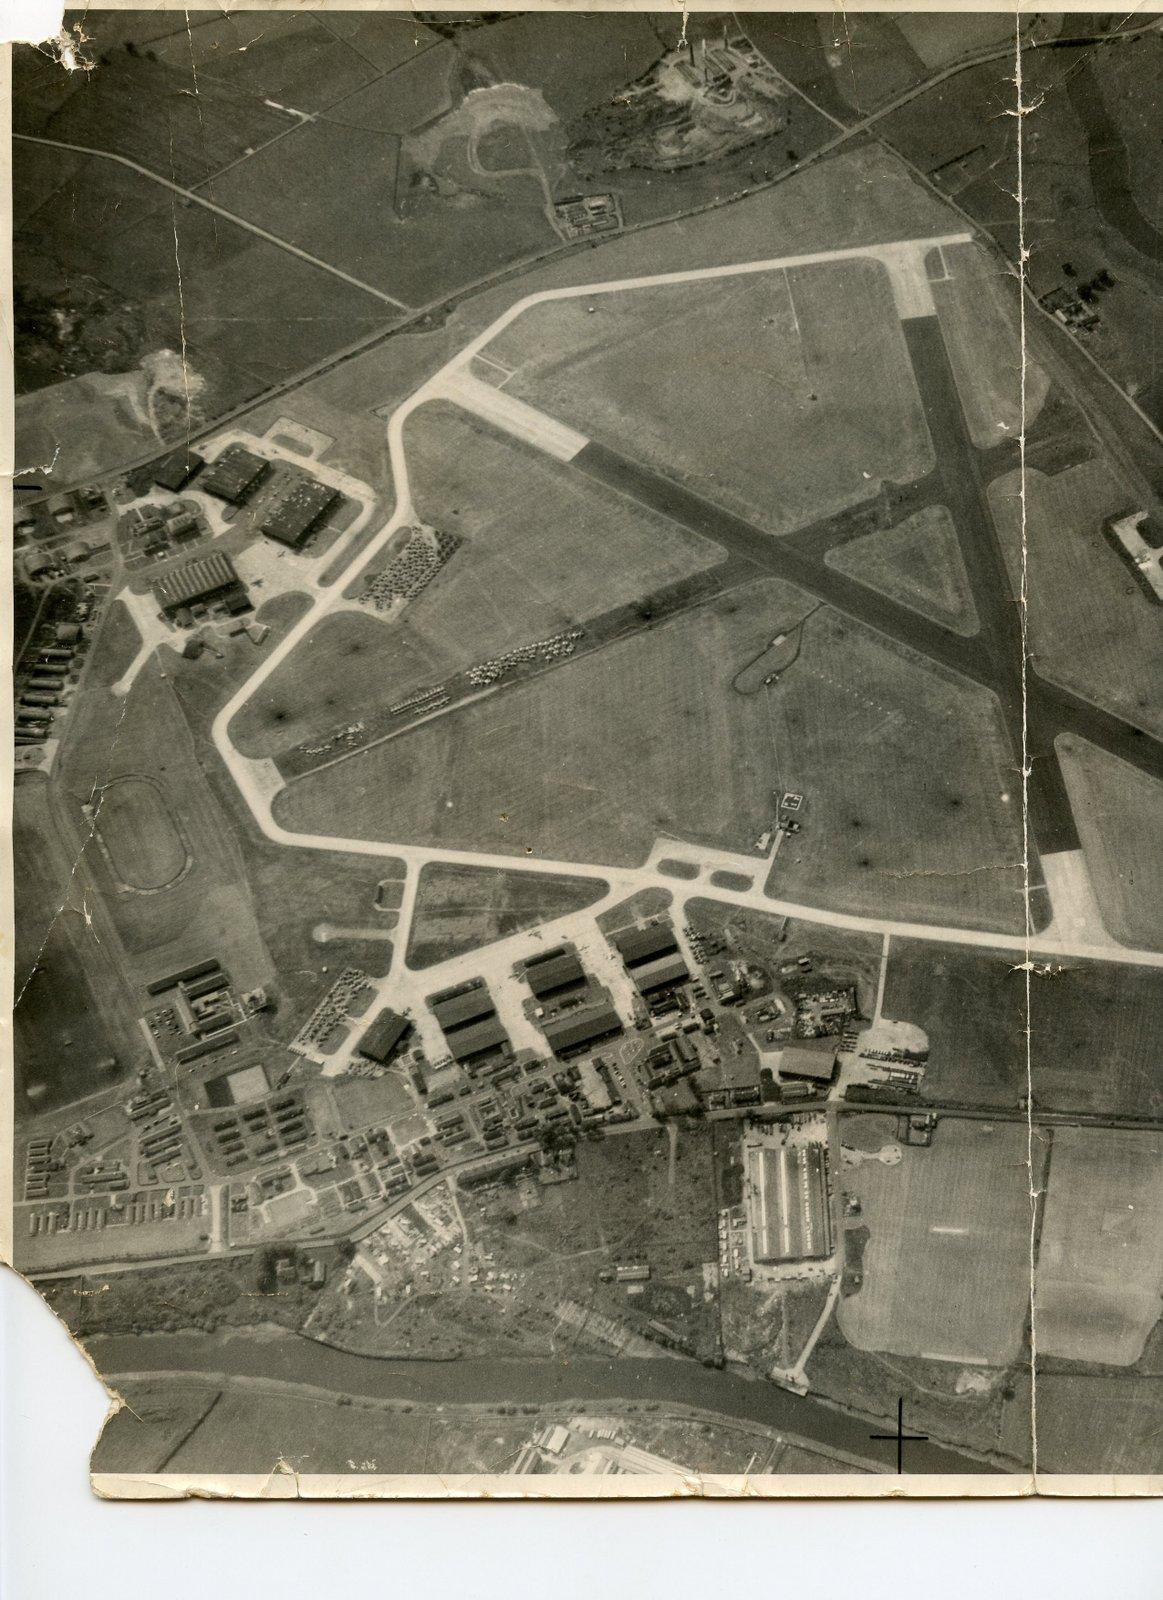 Glasgow Airport 1961